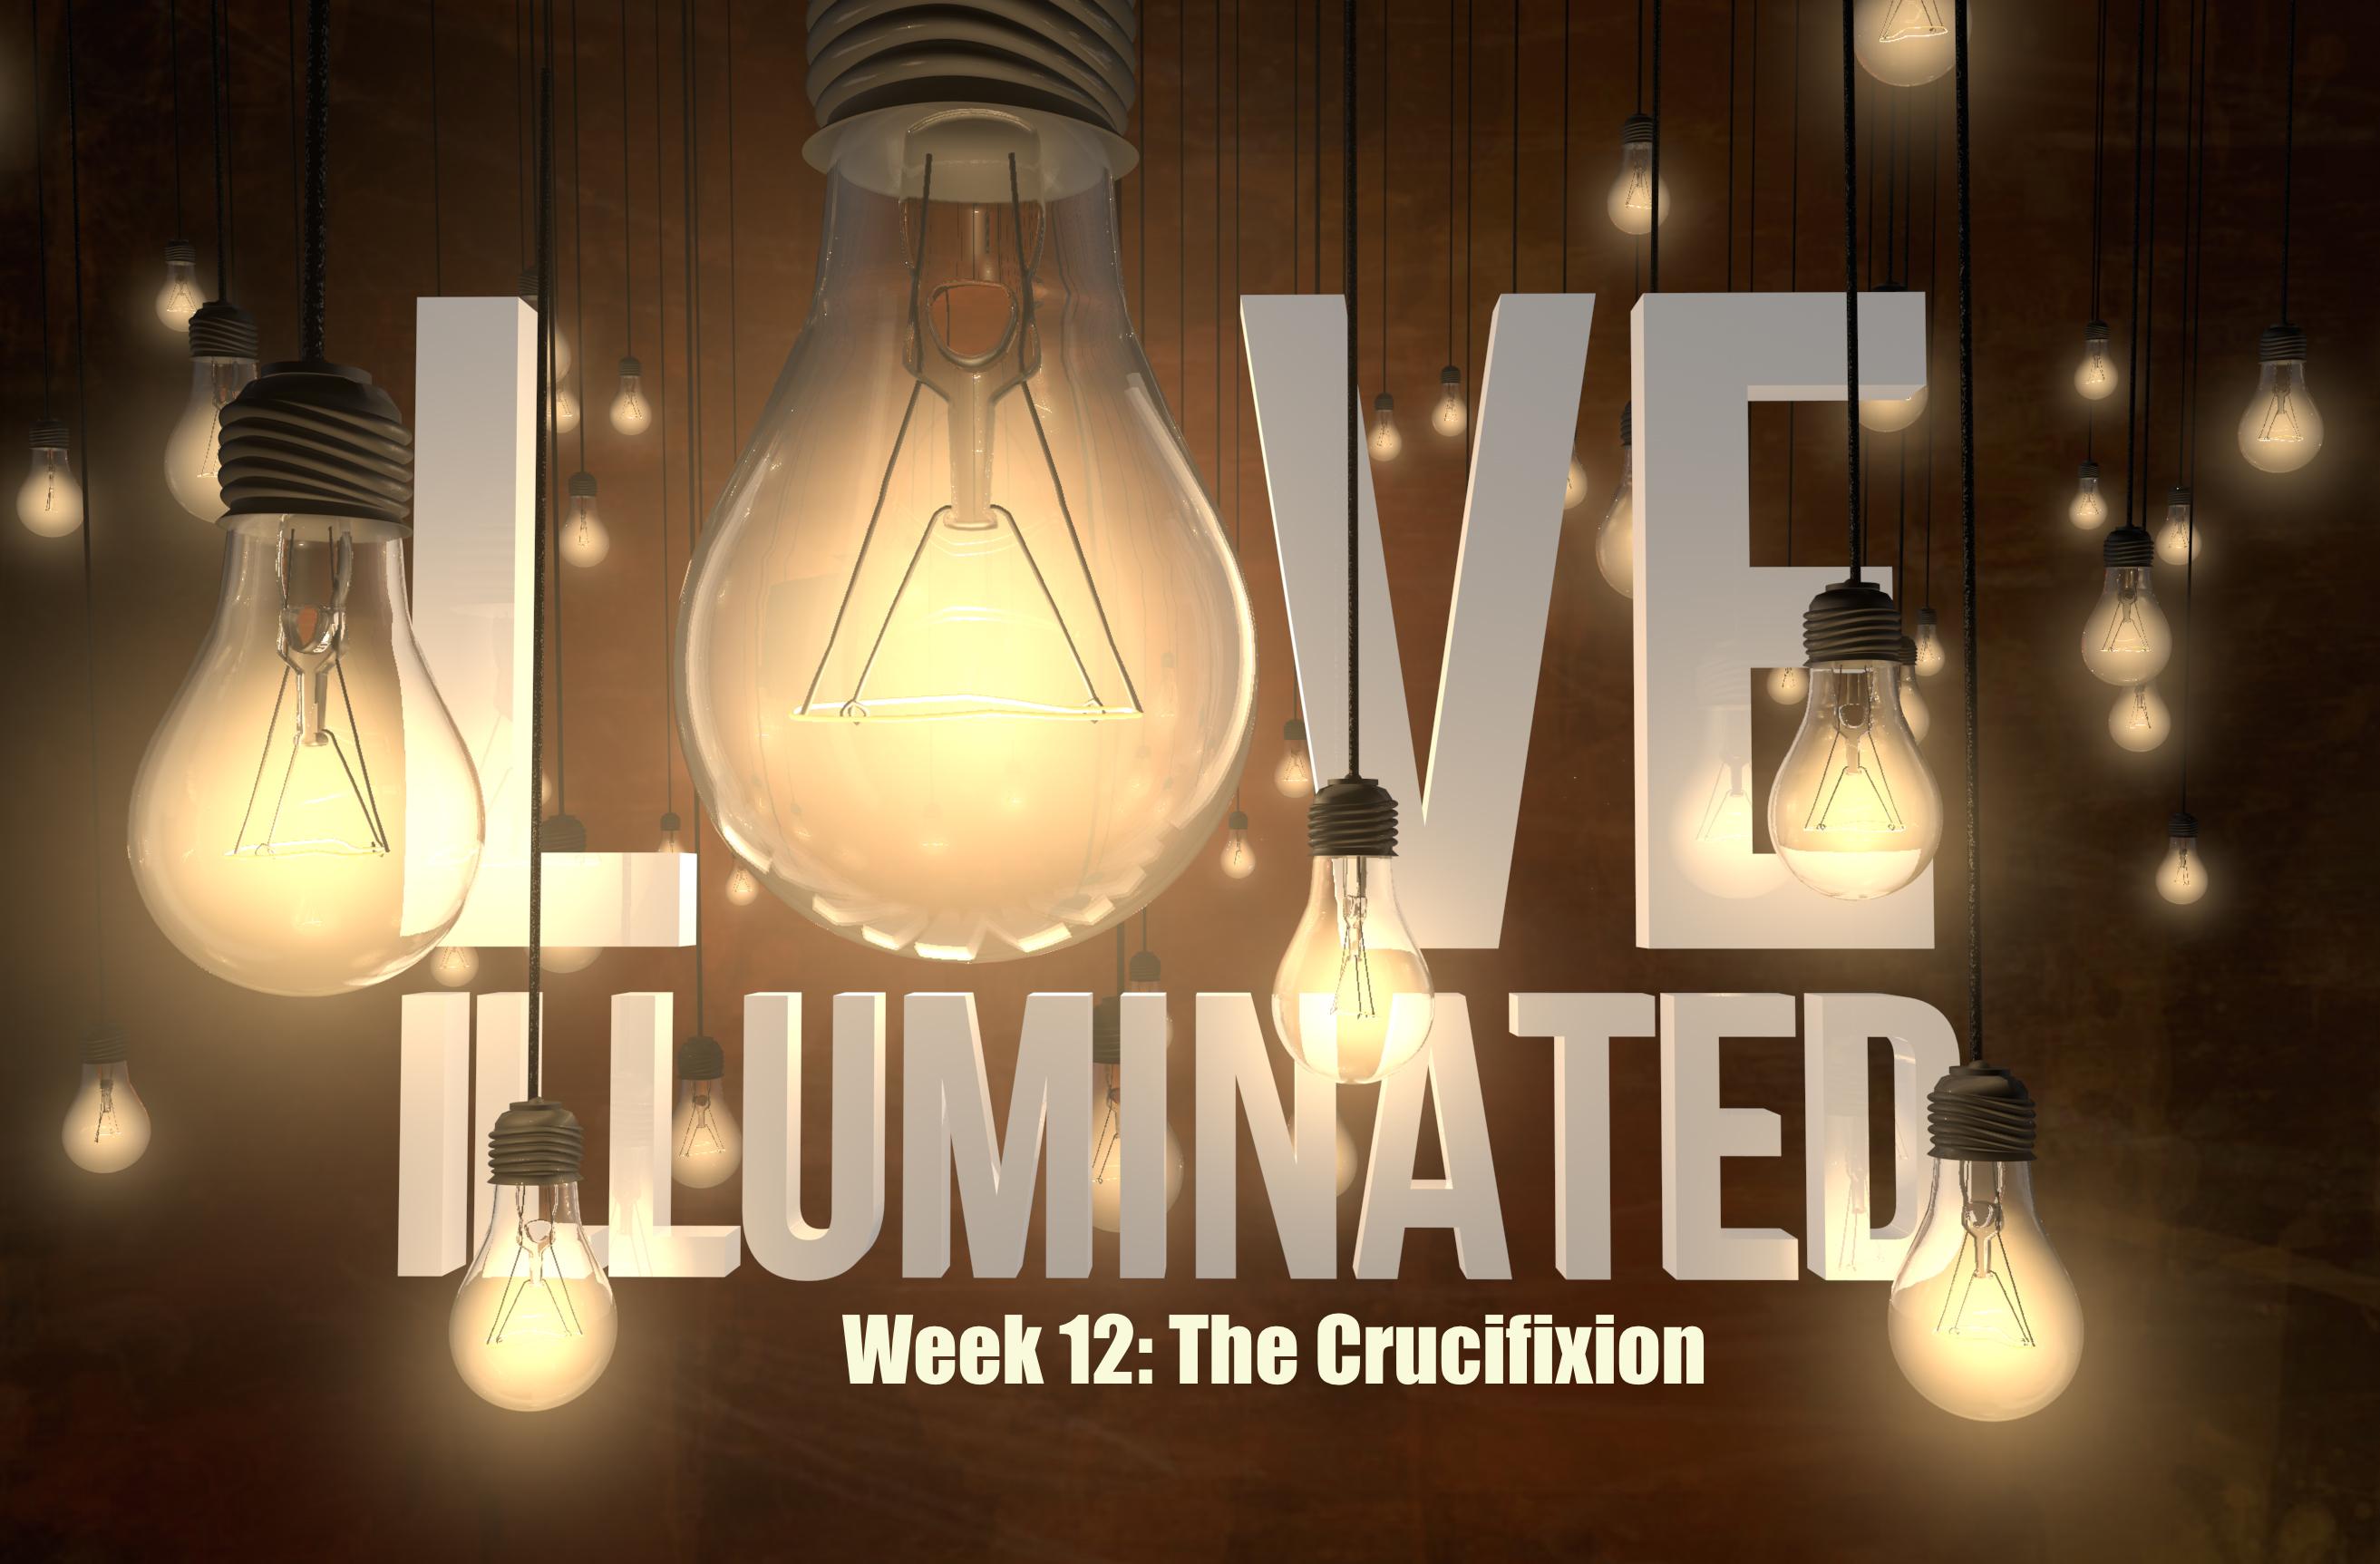 Love Illuminated, Part 12: The Crucifixion